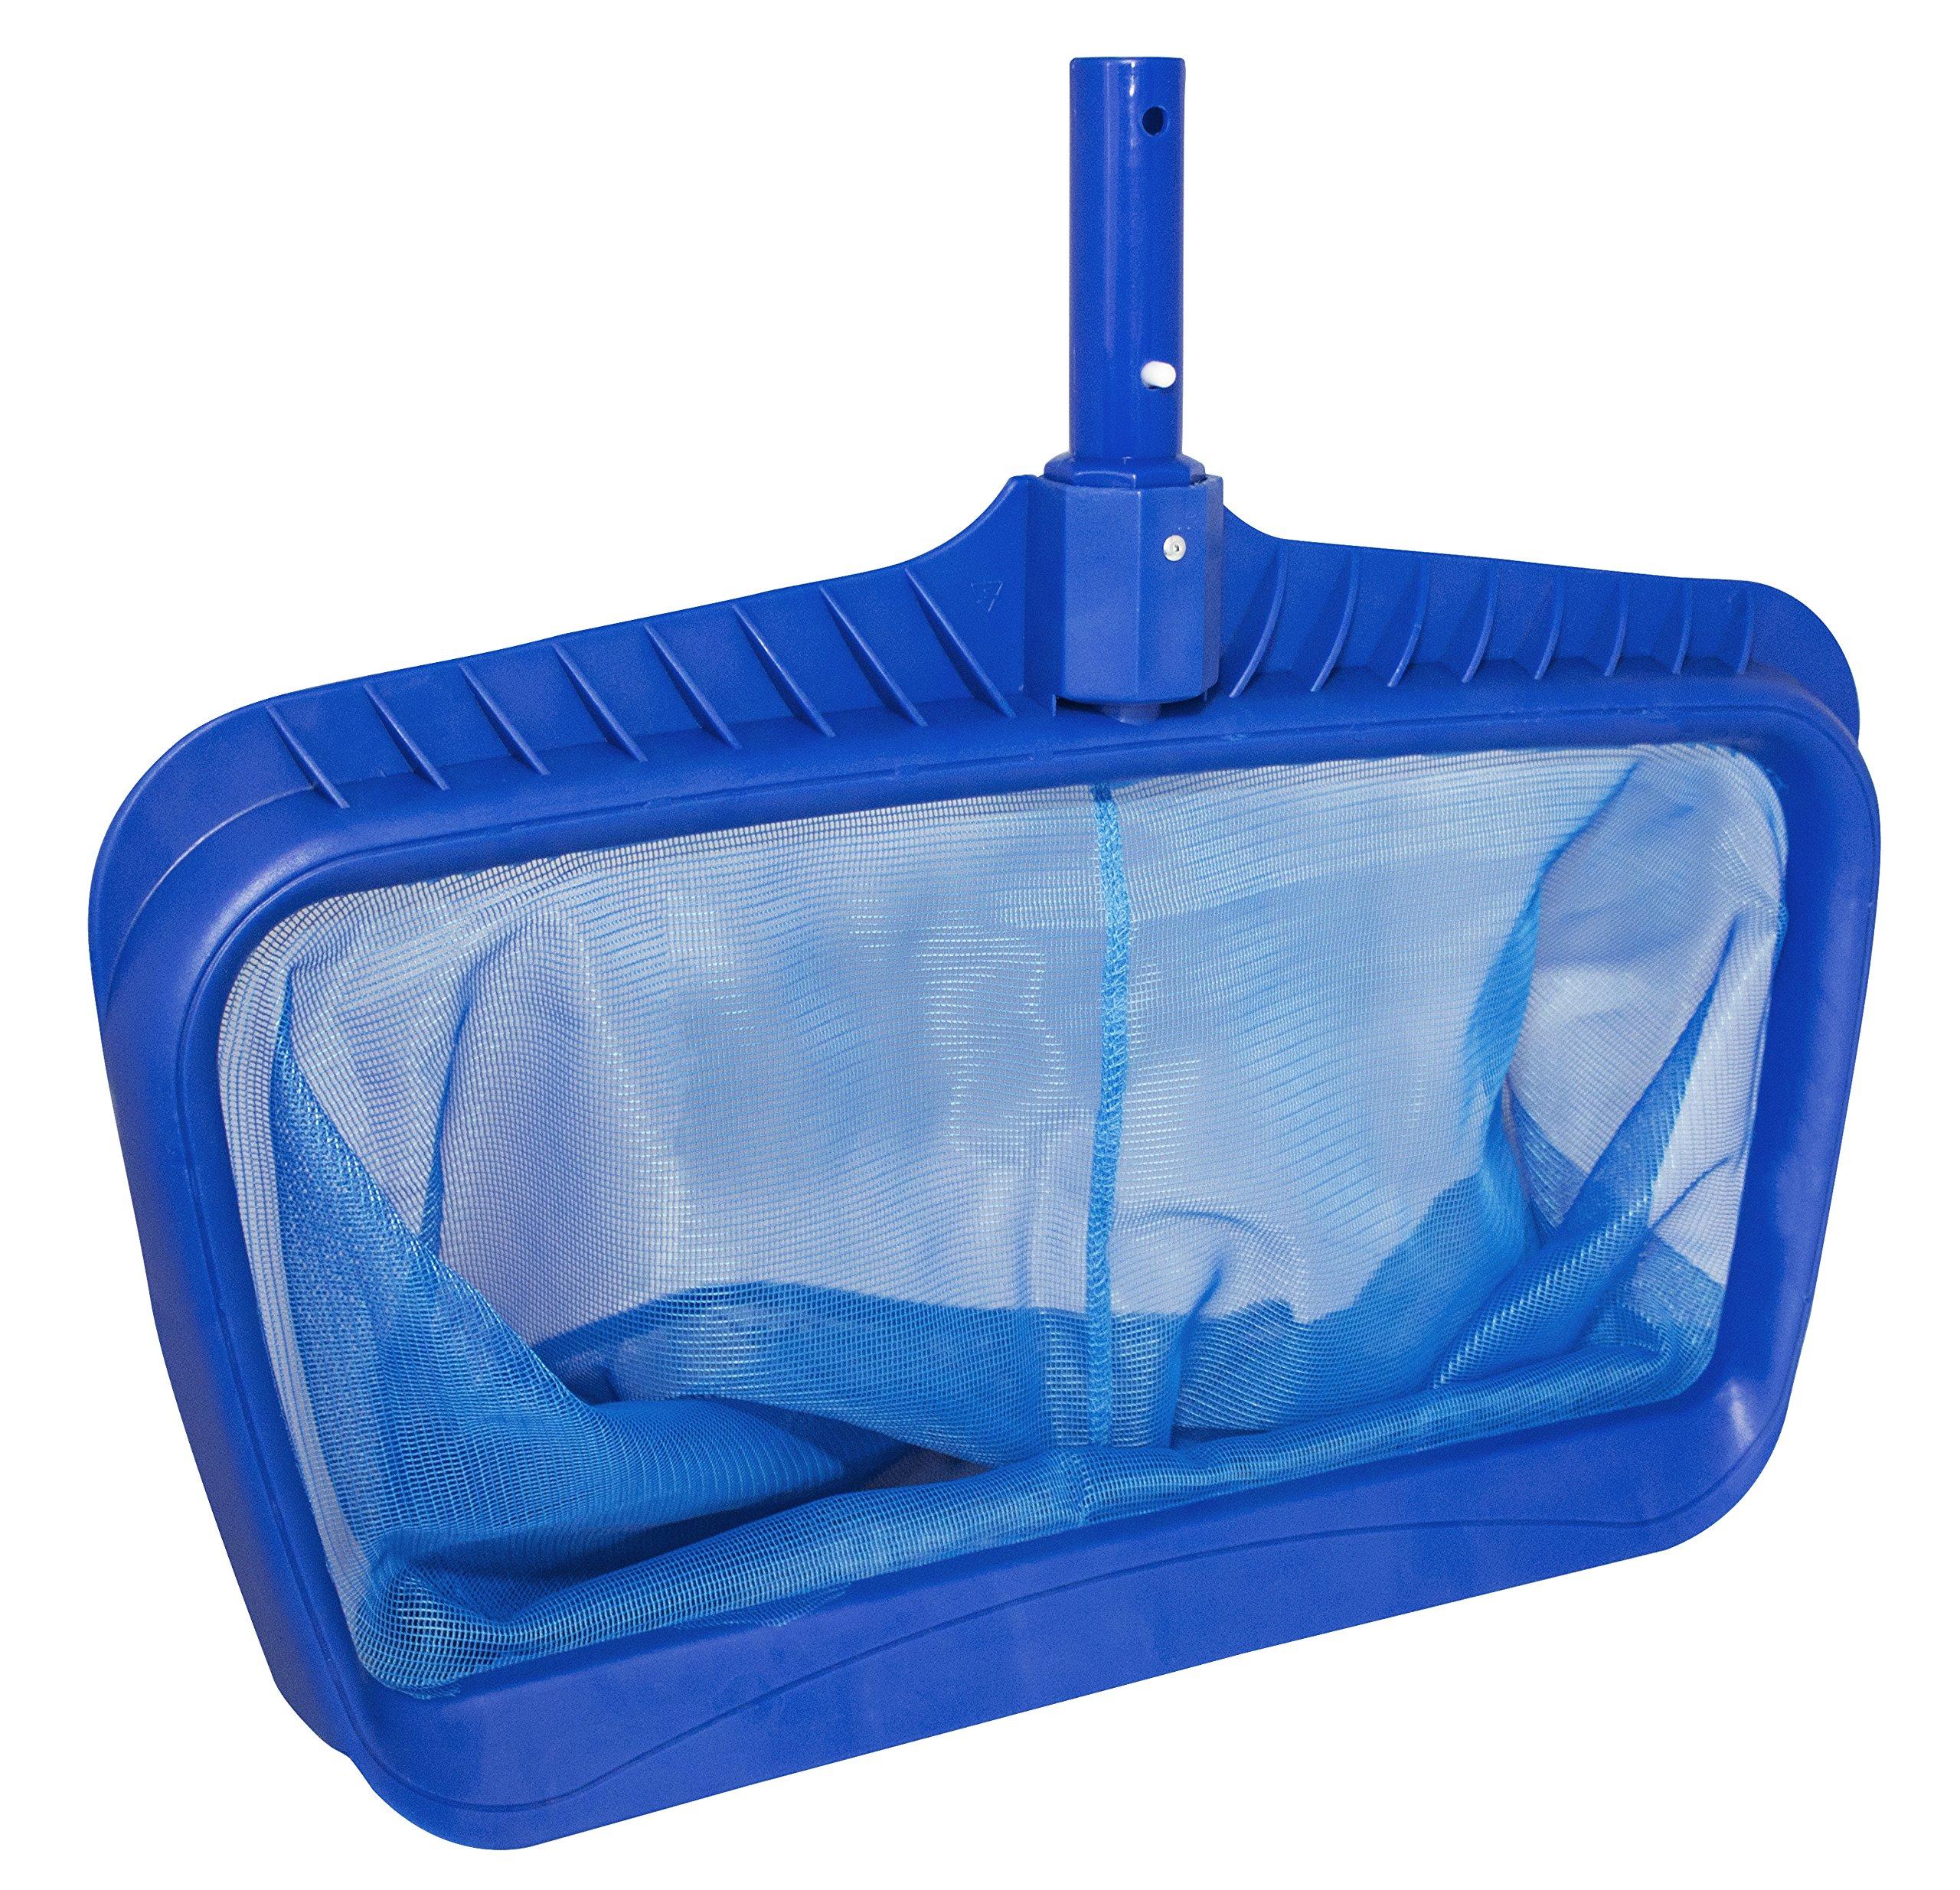 Swimline Professional Heavy Duty Deep-Bag Pool Rake, Blue by Swimline